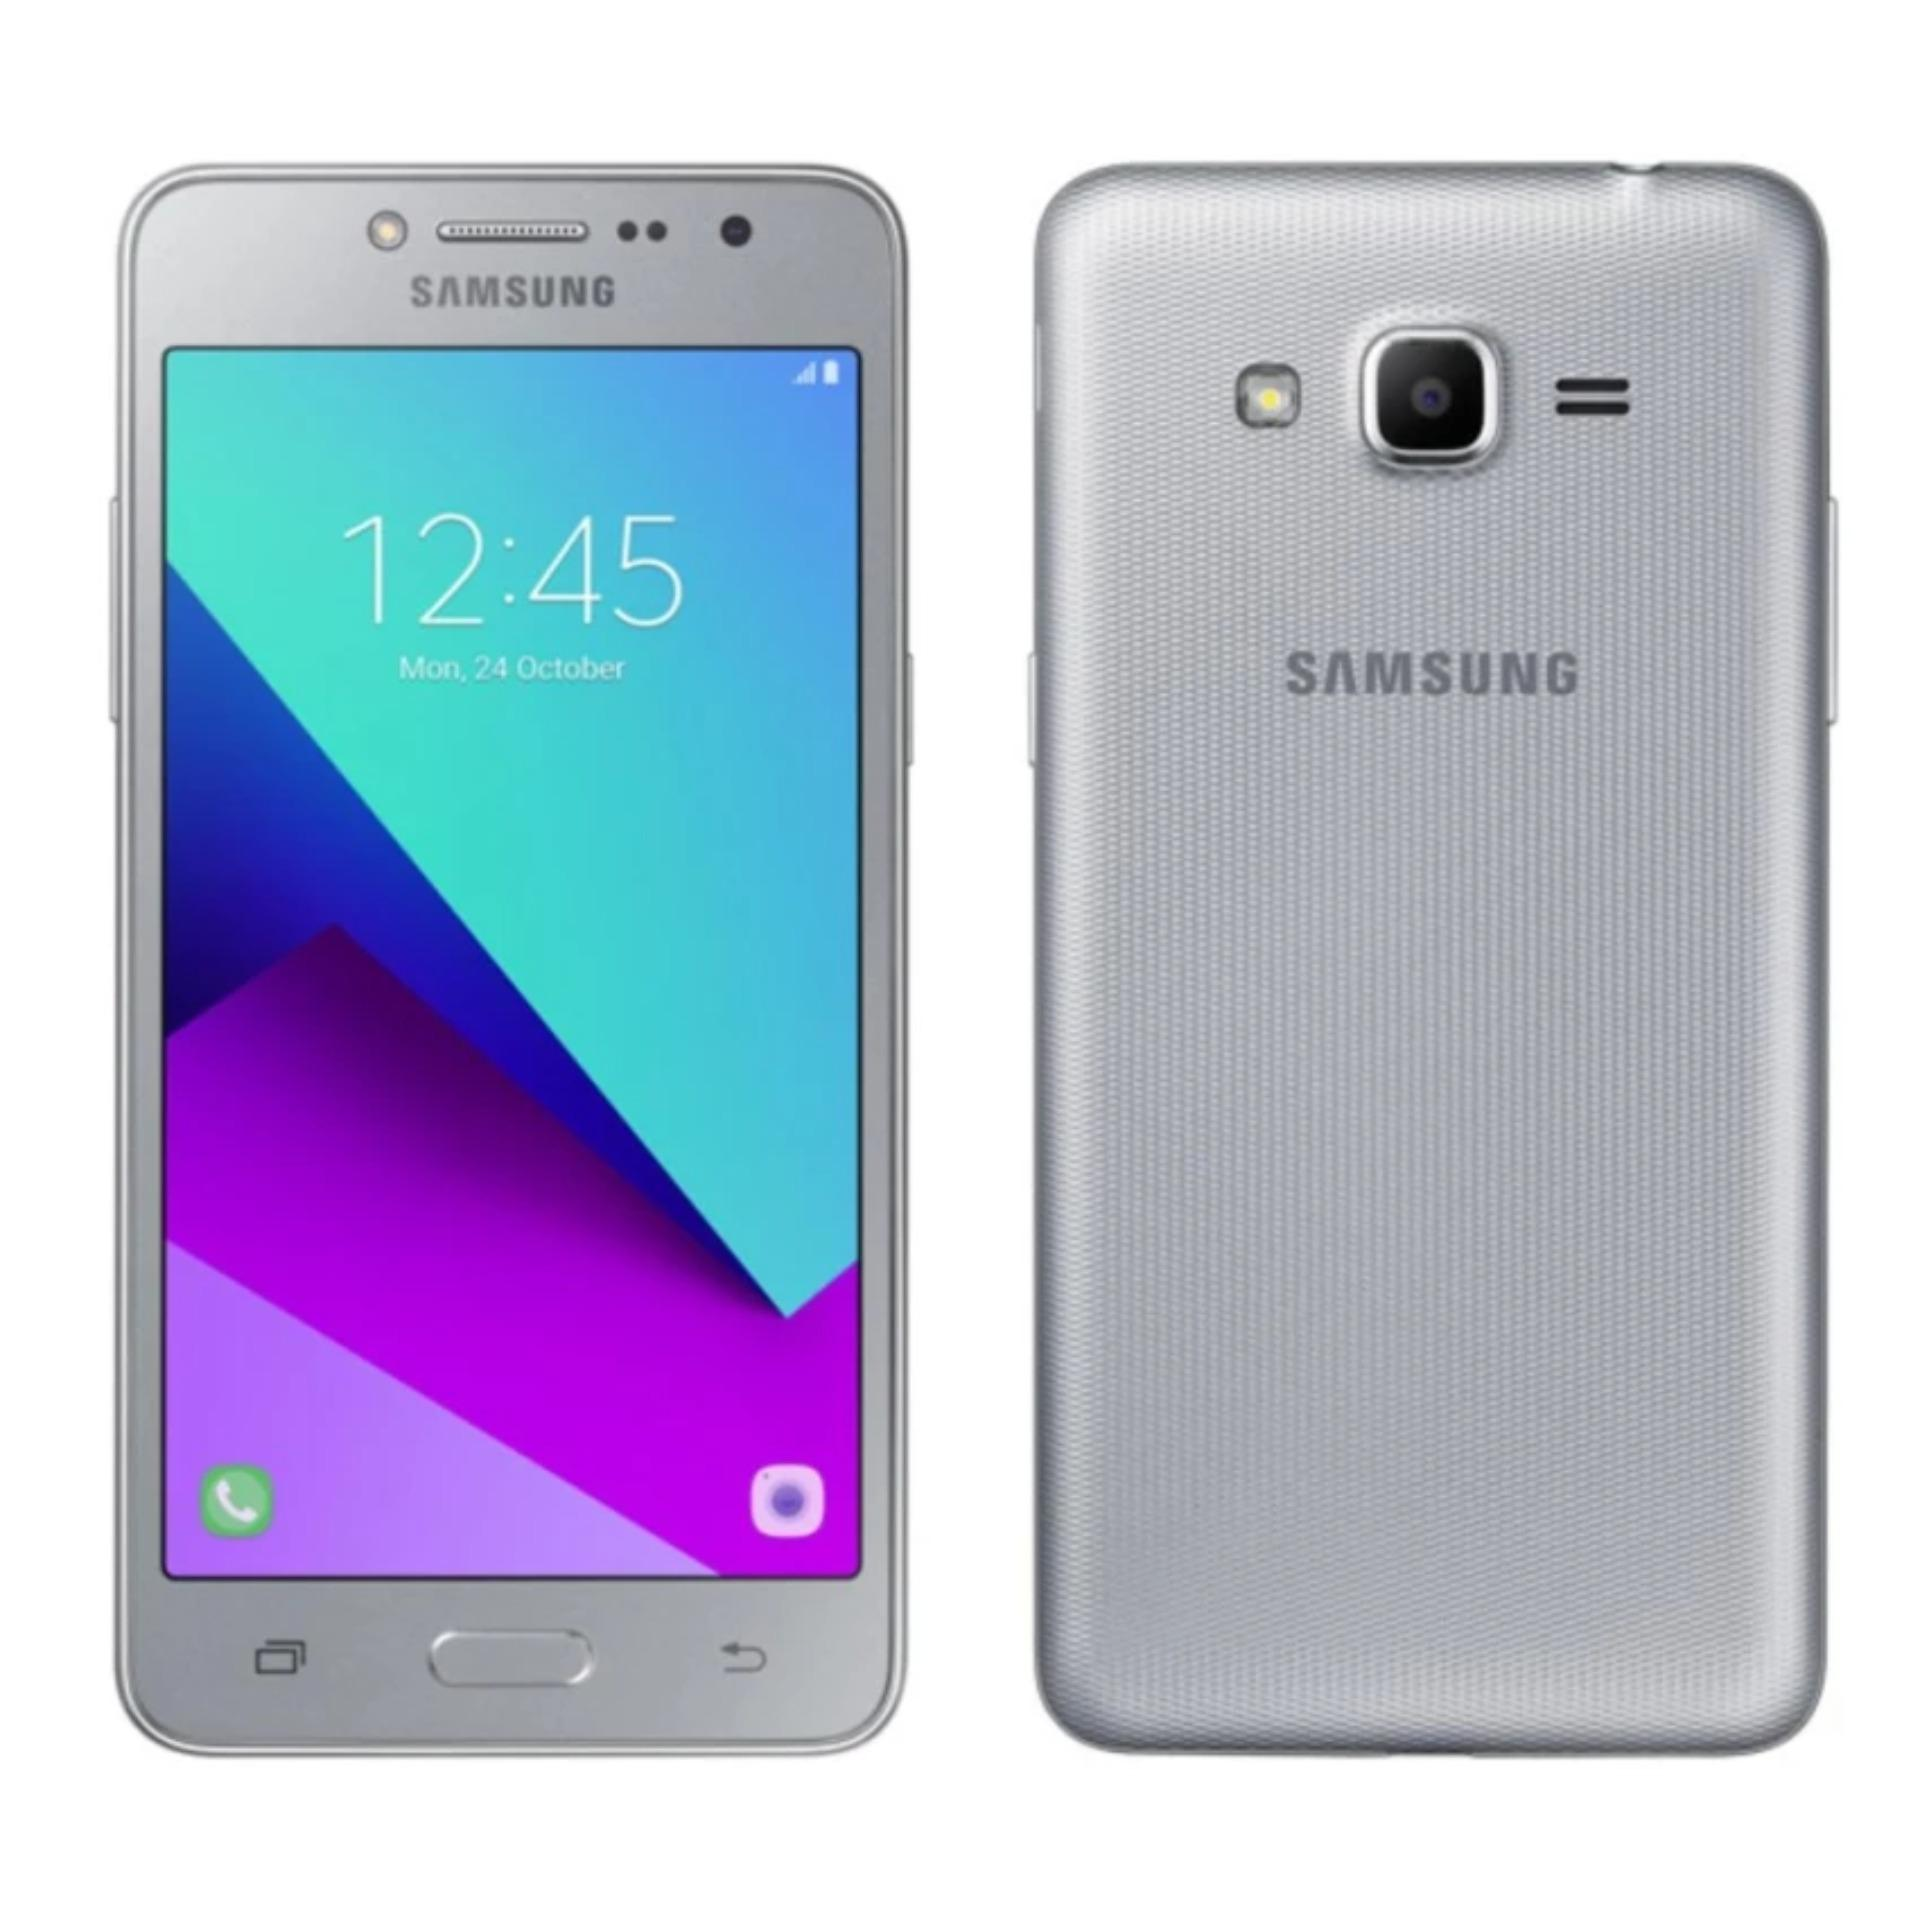 Garansi Resmi SEIN 1 Tahun Samsung Galaxy G532 J2 Prime Smartphone